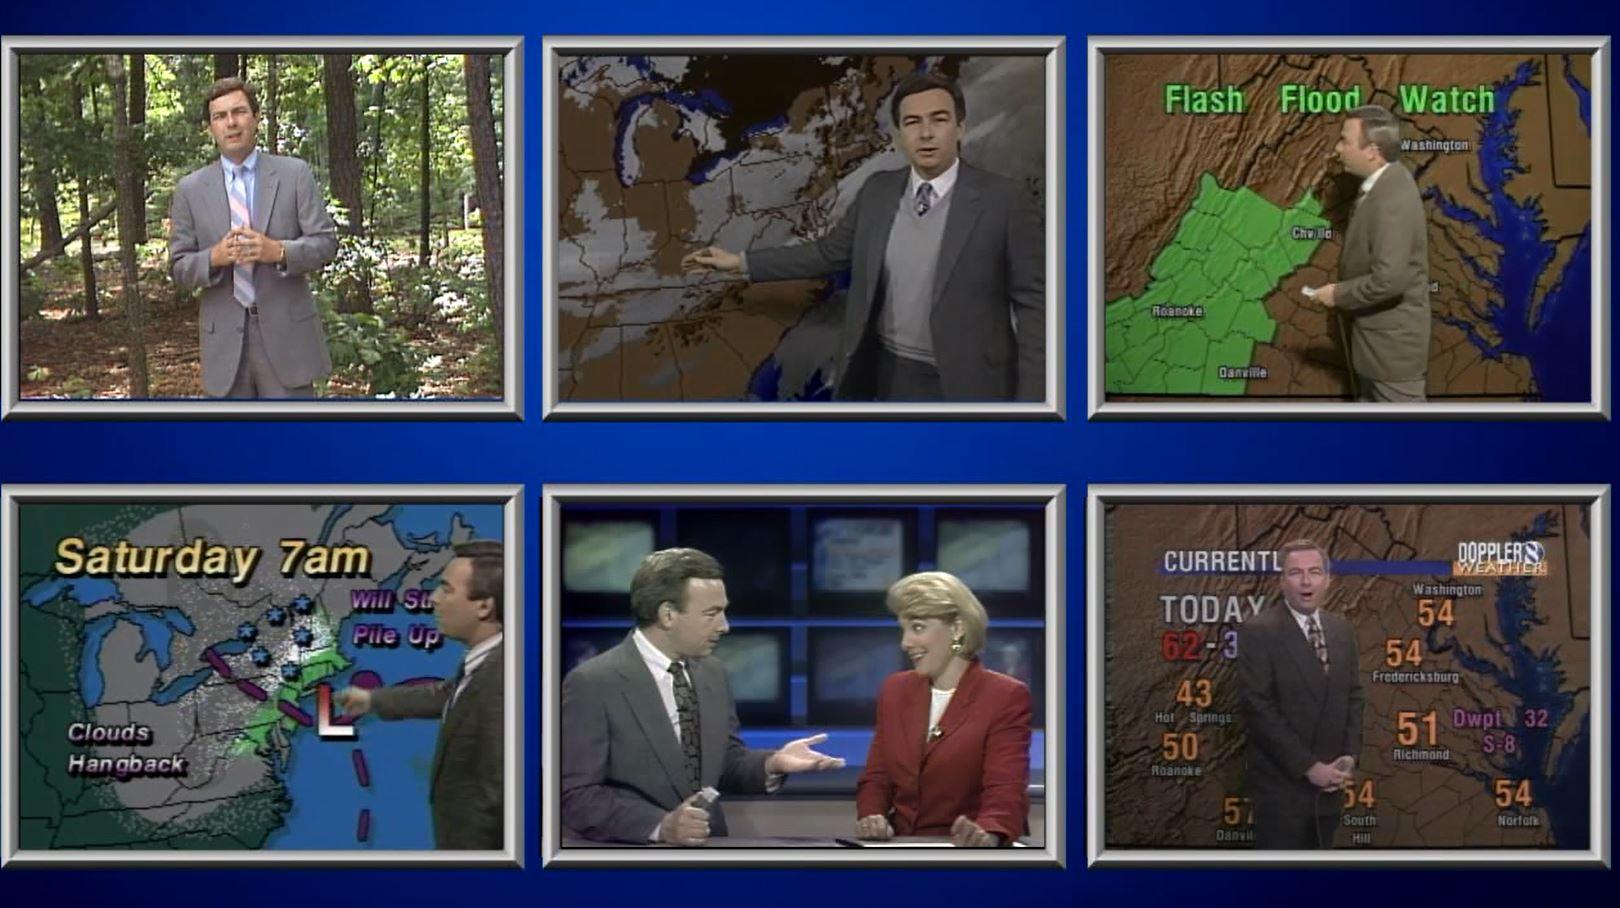 John Bernier celebrates 35 years at 8News